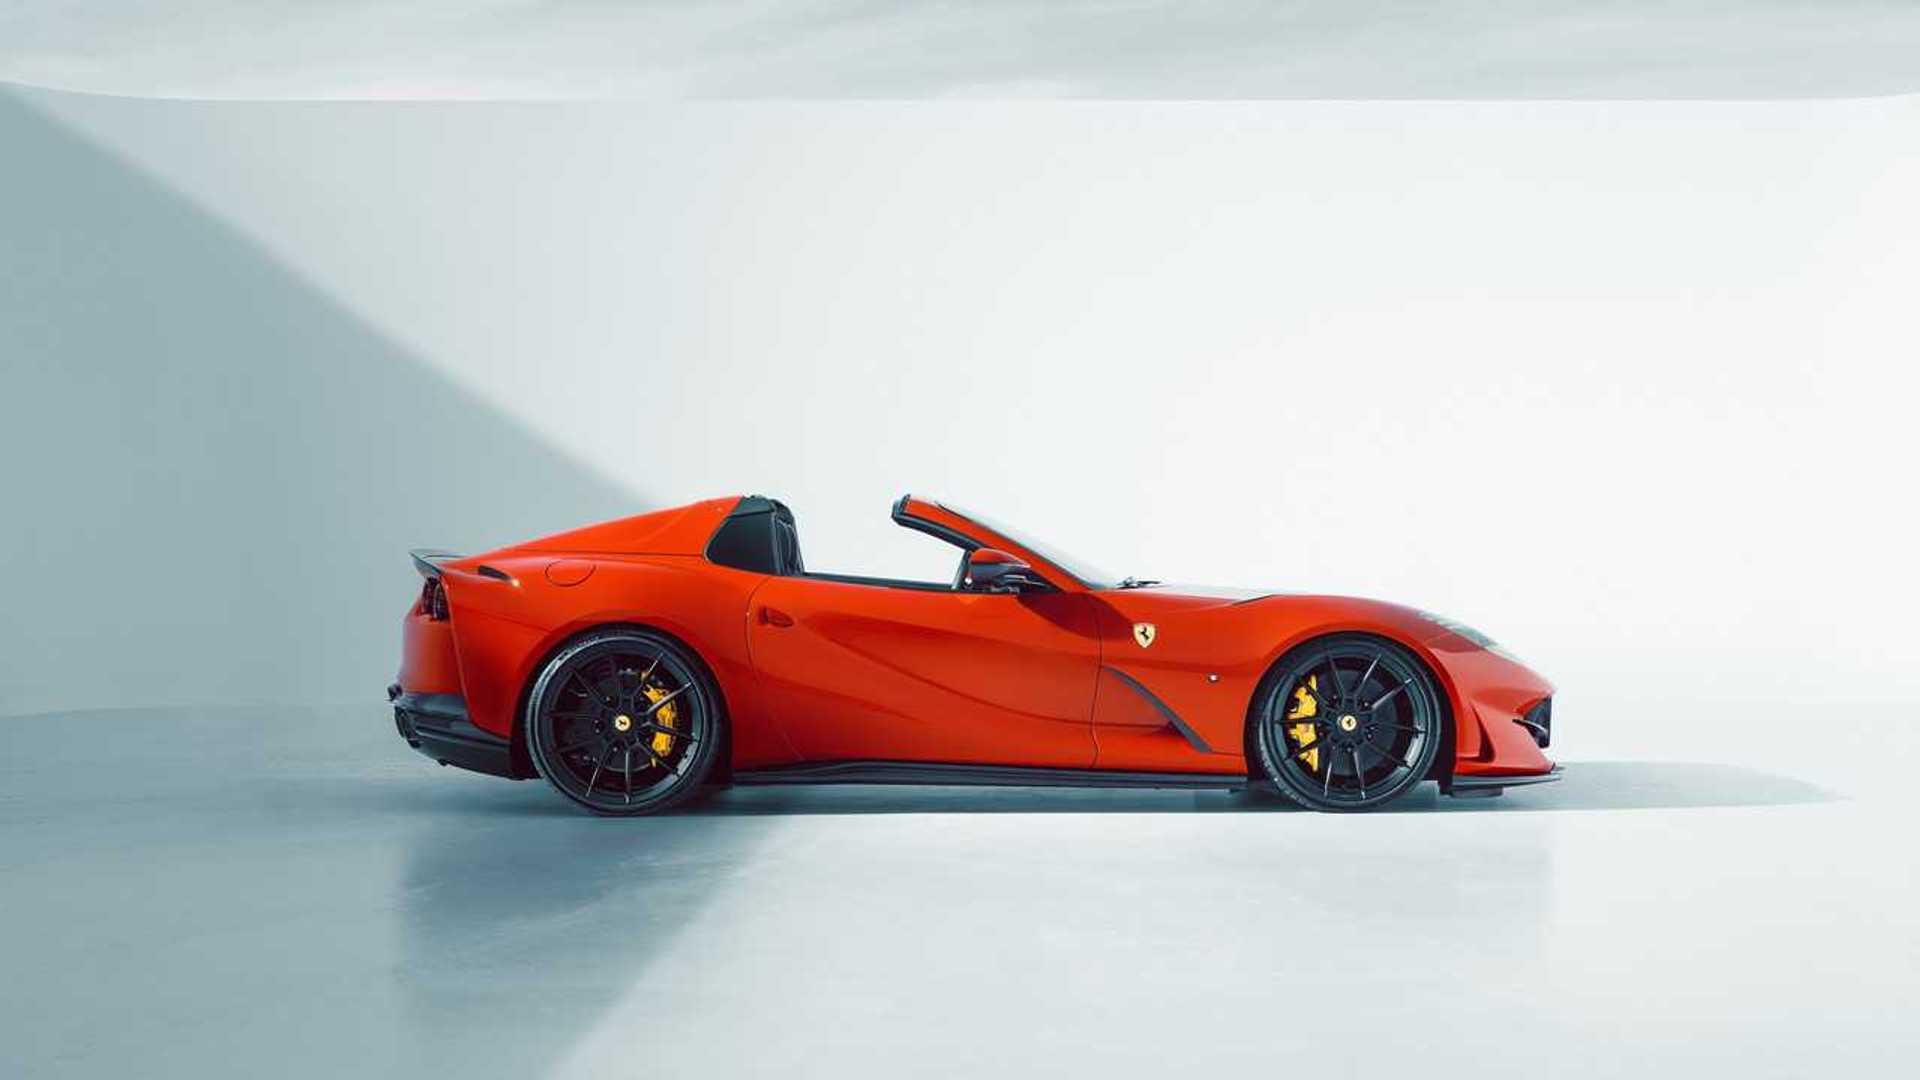 Check Out Novitec's Variation On The Ferrari 812 GTS - Motor1